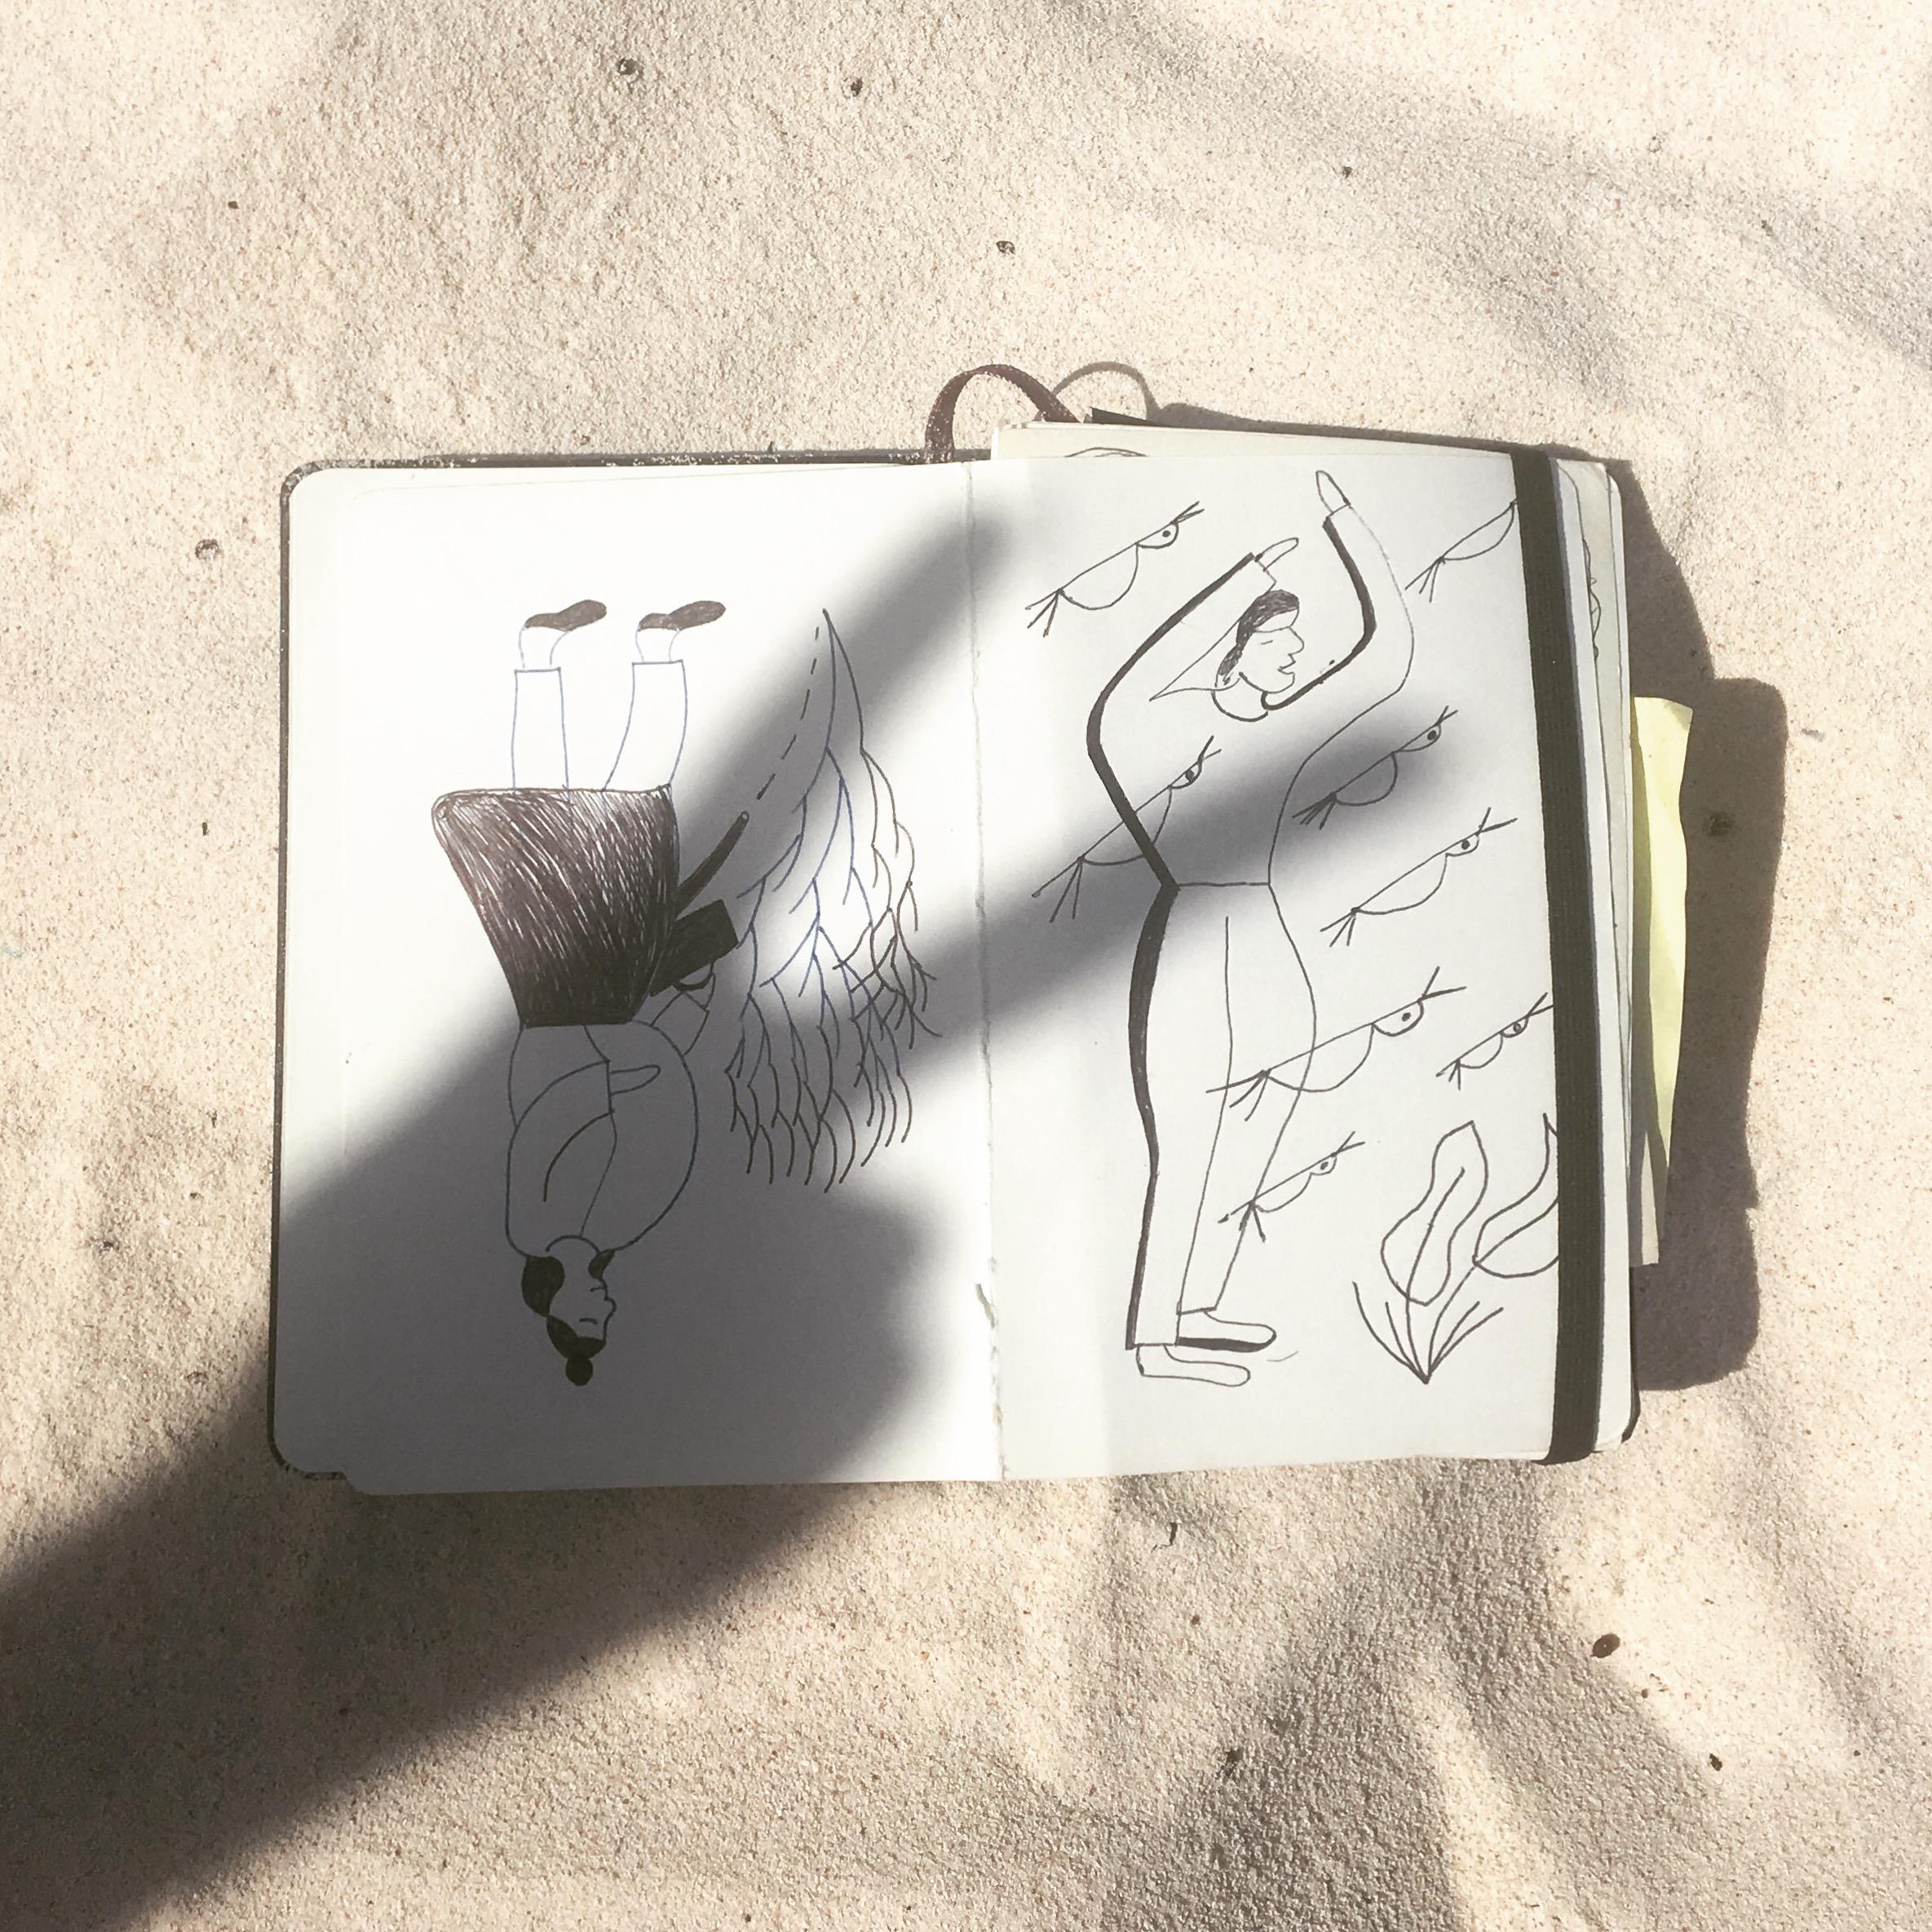 drawing in sketchbook, peace sign shadow